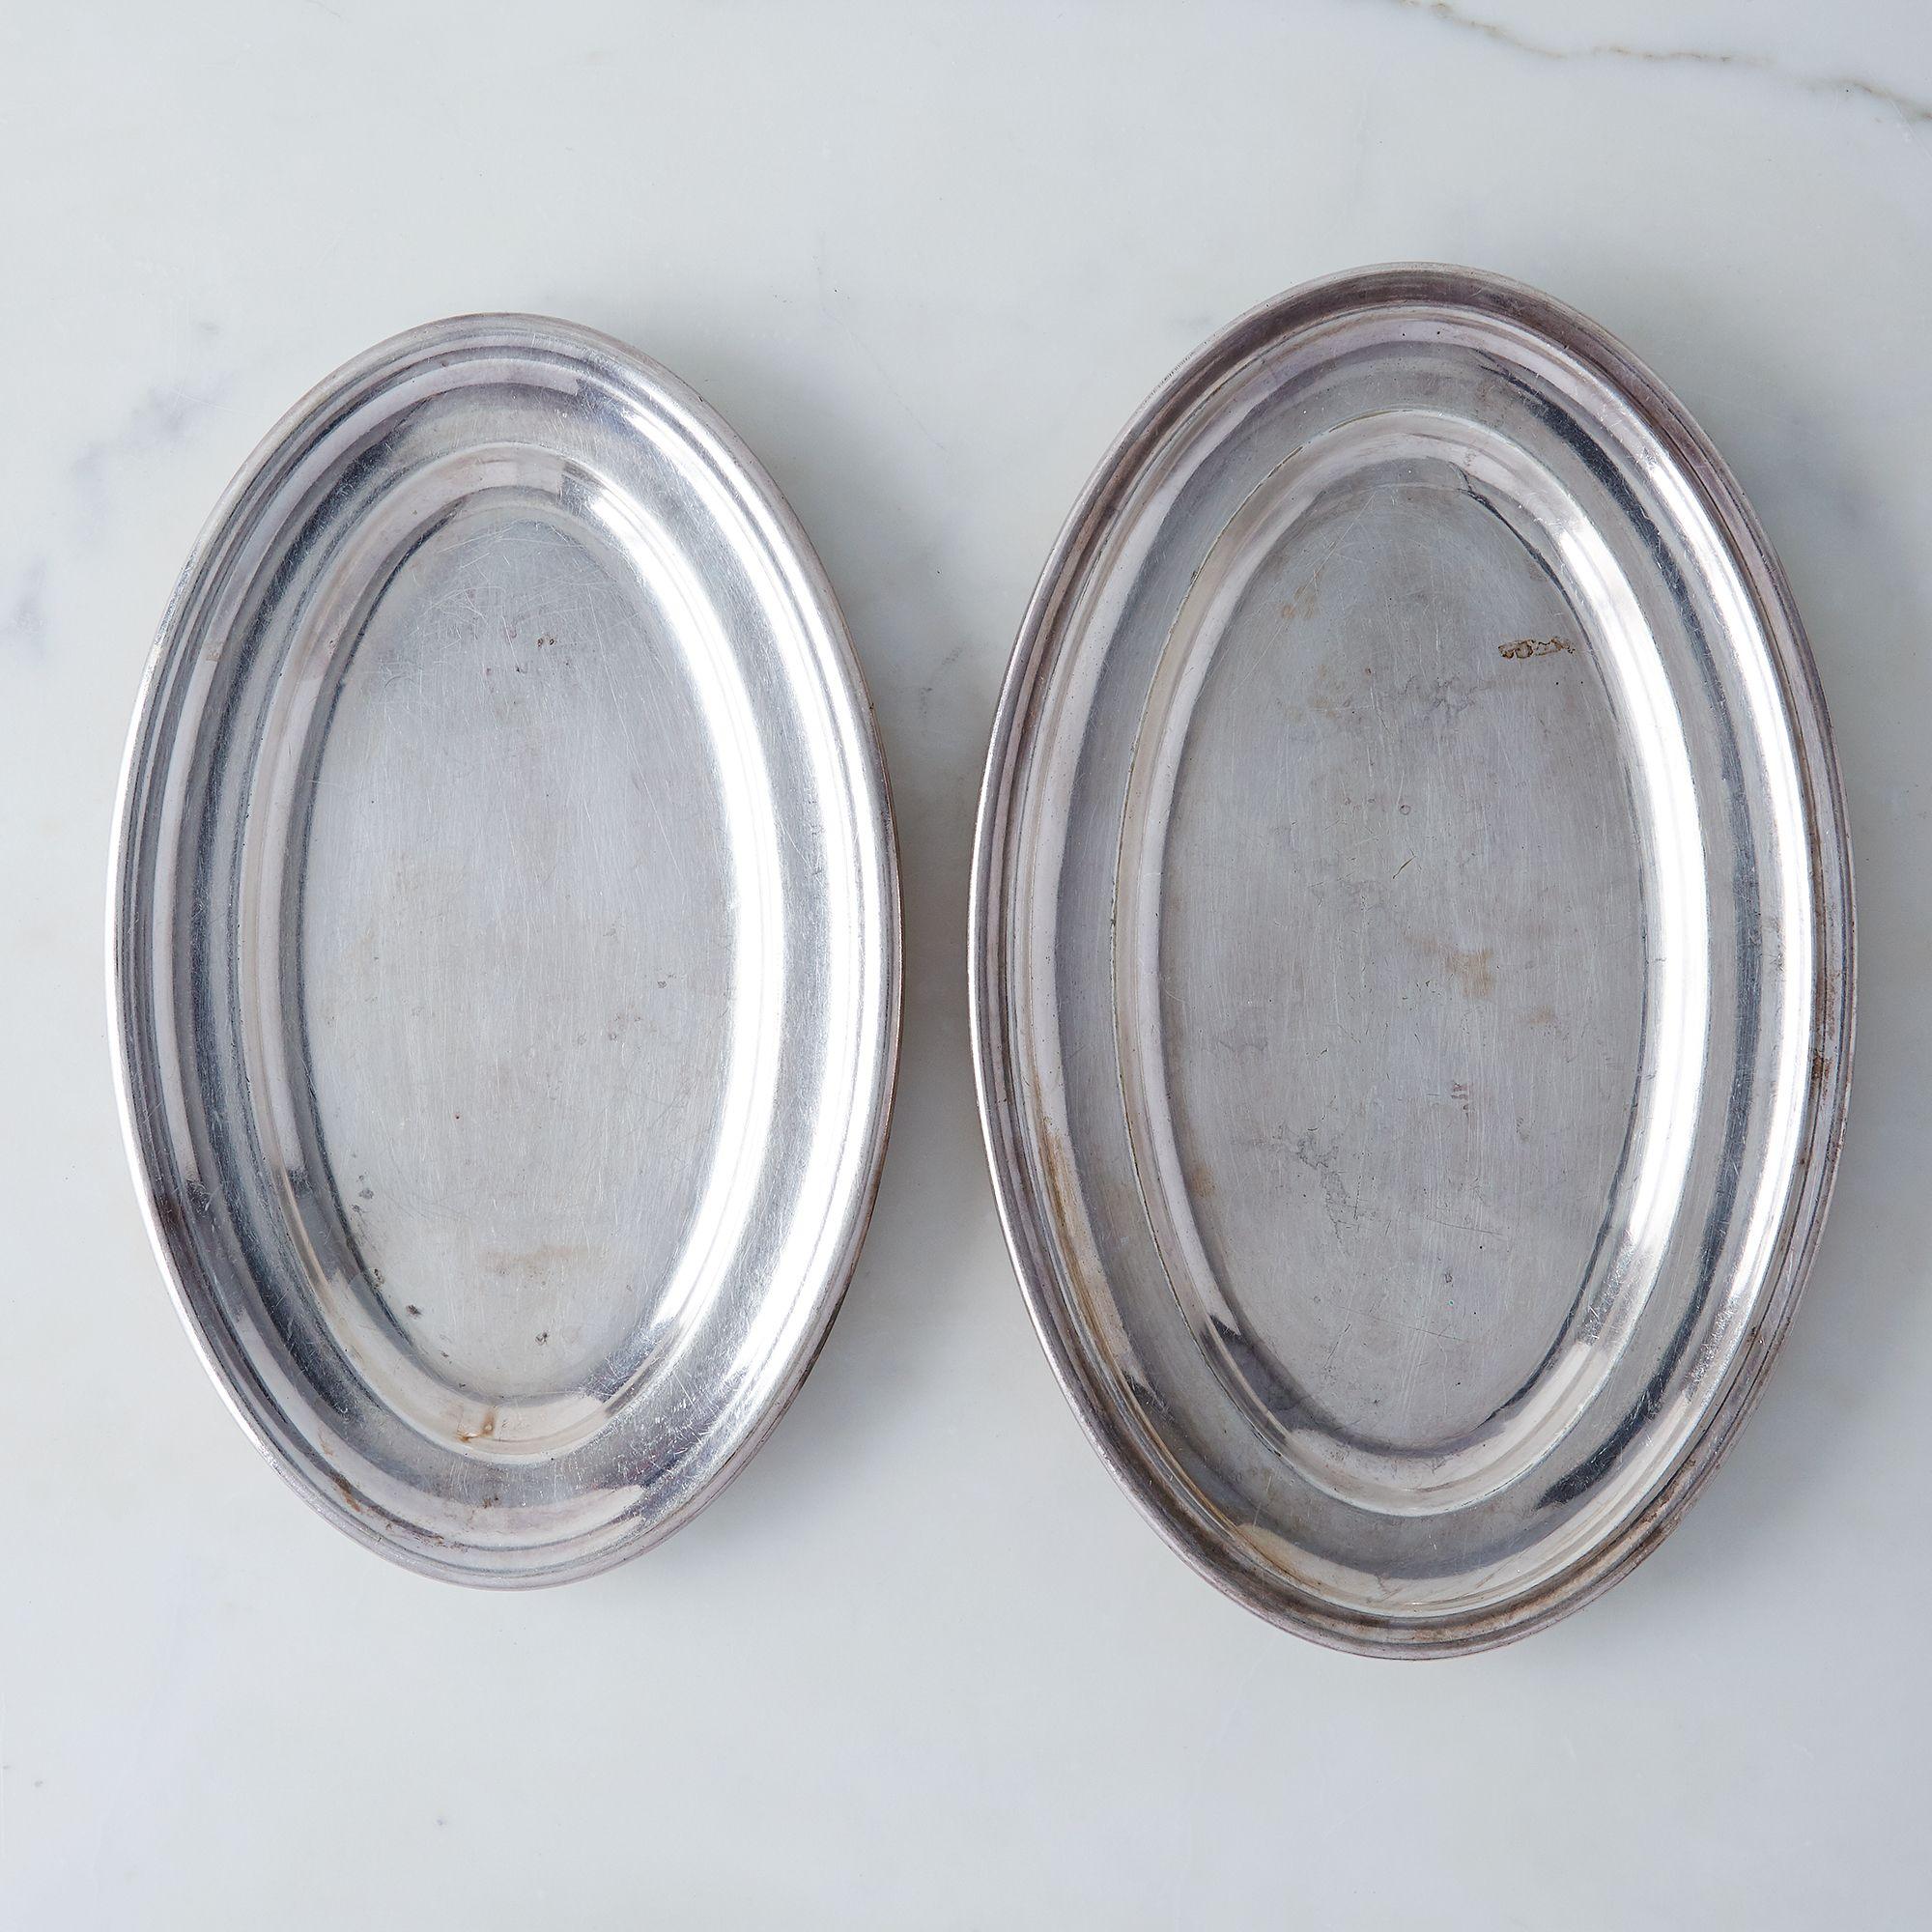 F5298ad8 56a3 46f0 86c2 6f6ee89655af  2015 0521 elsie green vintage french hotel silver platter silo alpha smoot 203